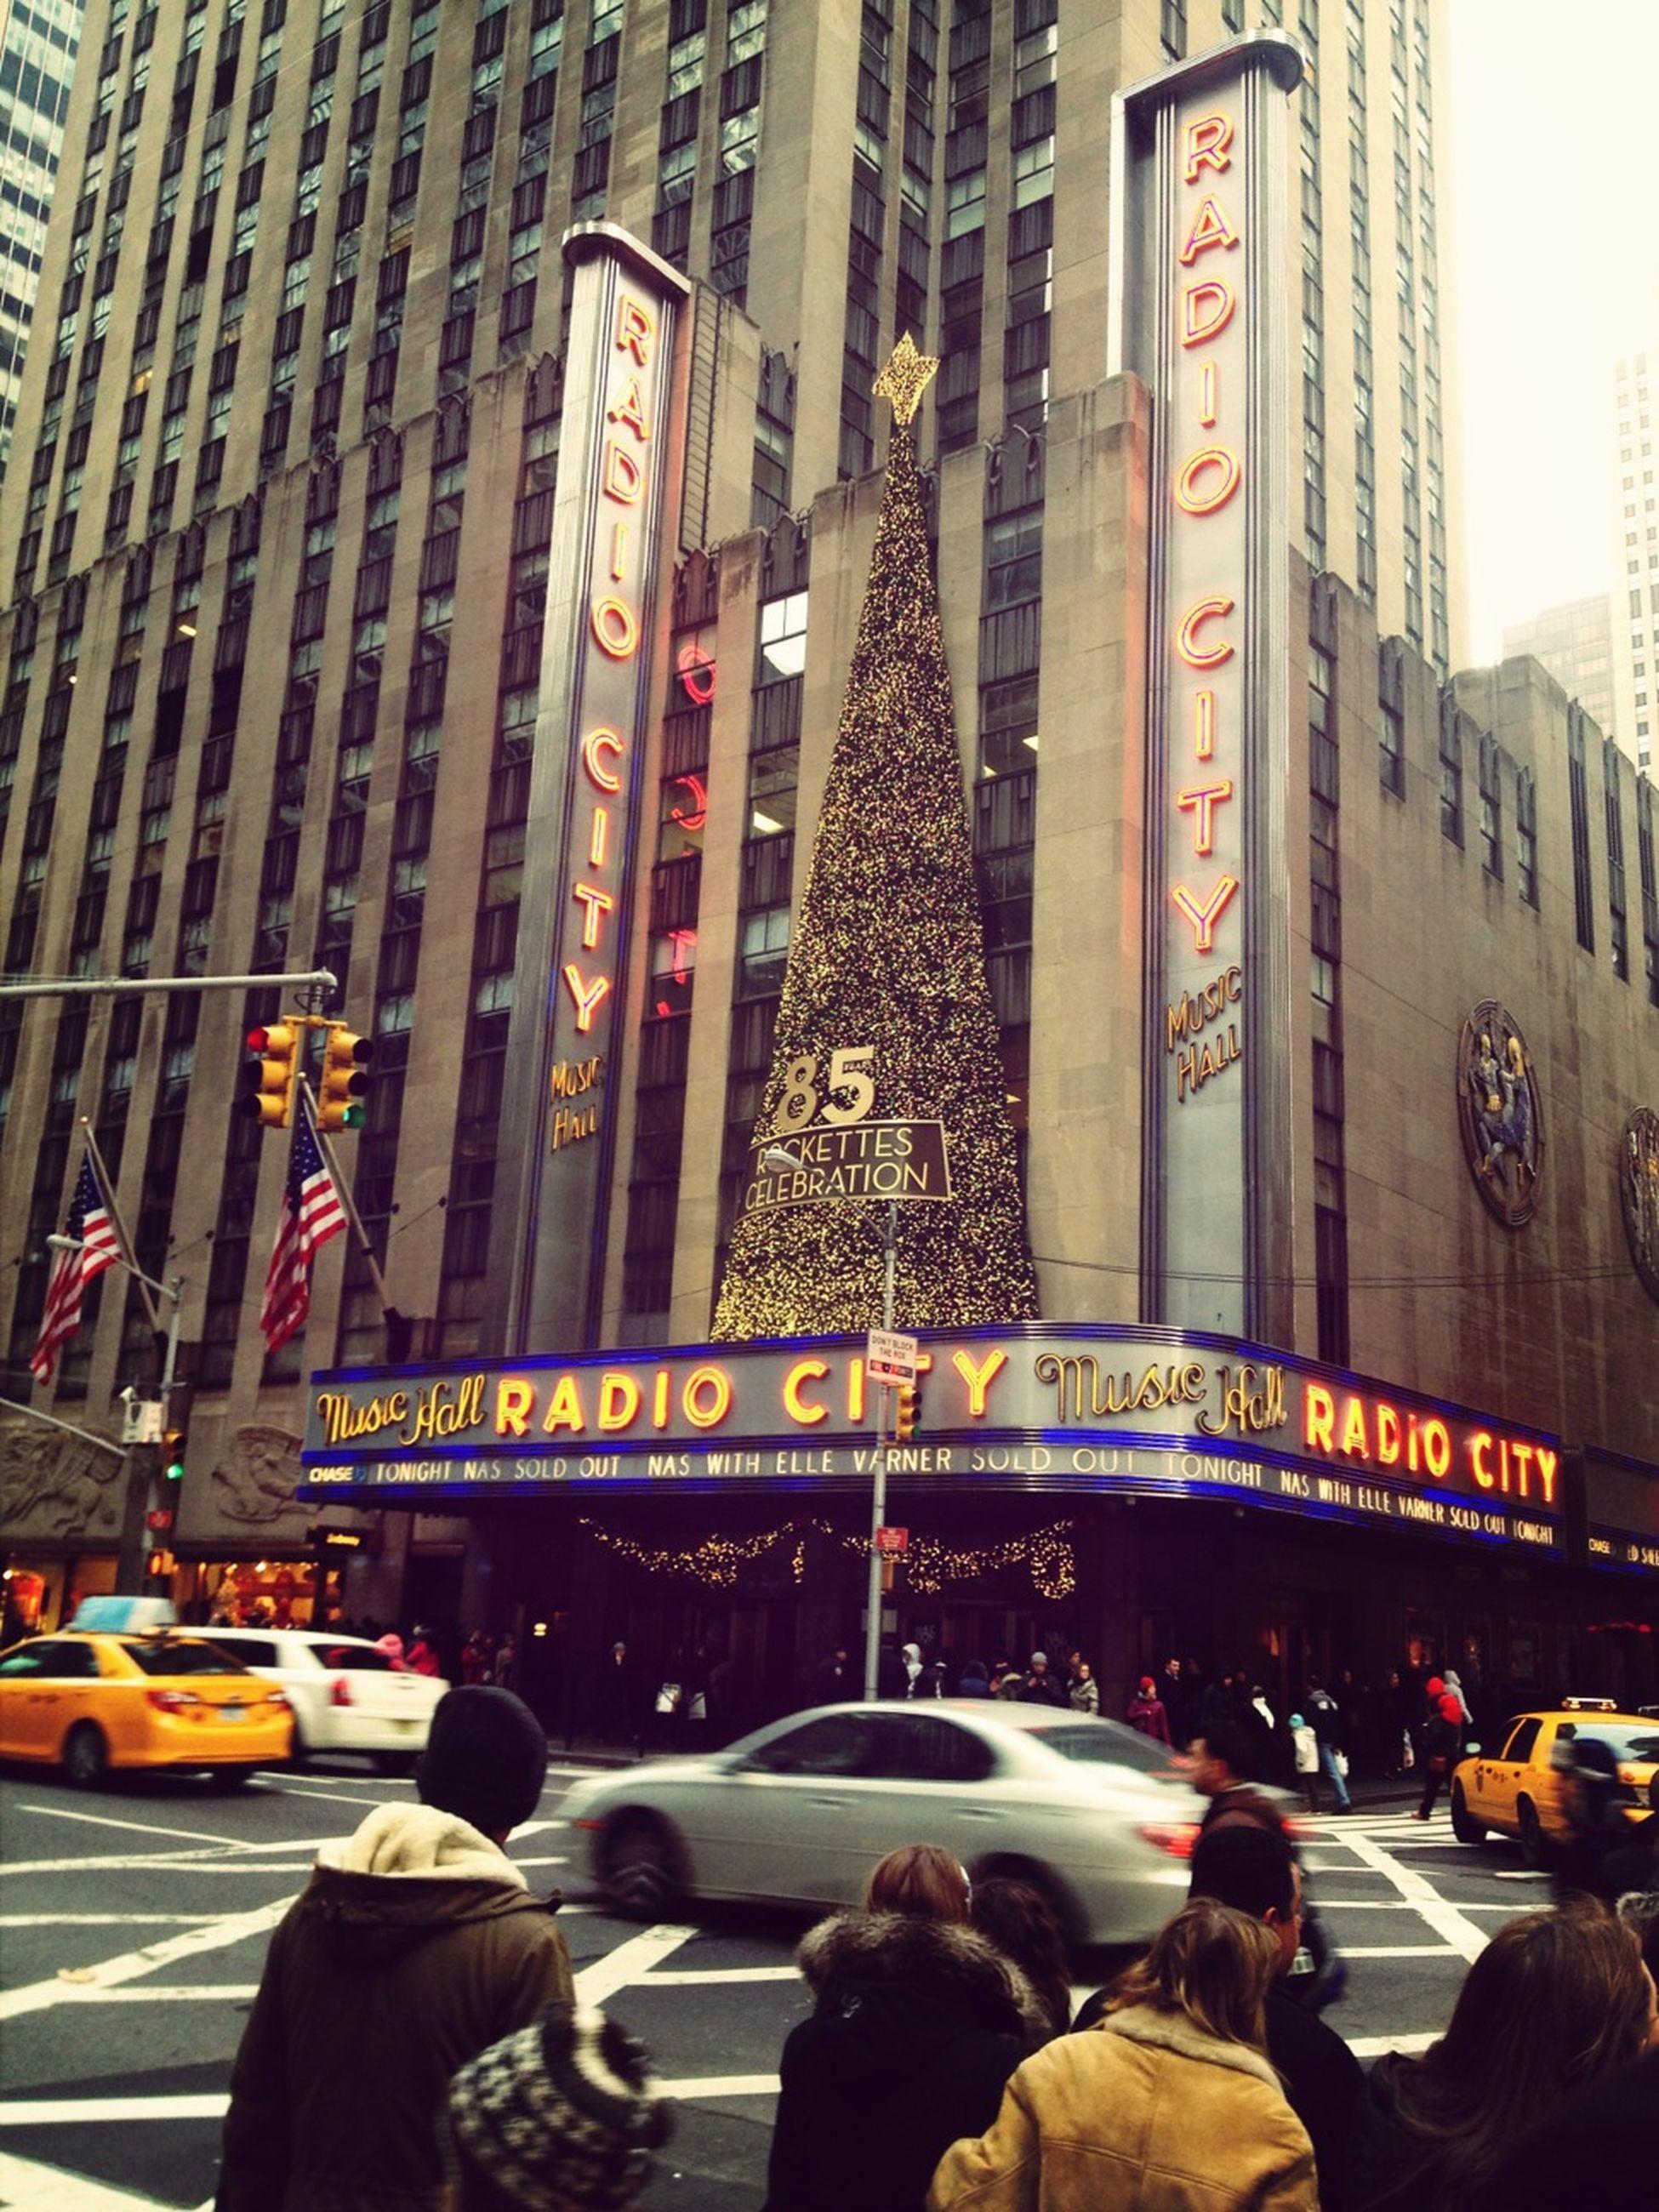 architecture, built structure, building exterior, city, large group of people, street, men, city life, person, lifestyles, city street, transportation, car, capital cities, leisure activity, road, travel destinations, crowd, famous place